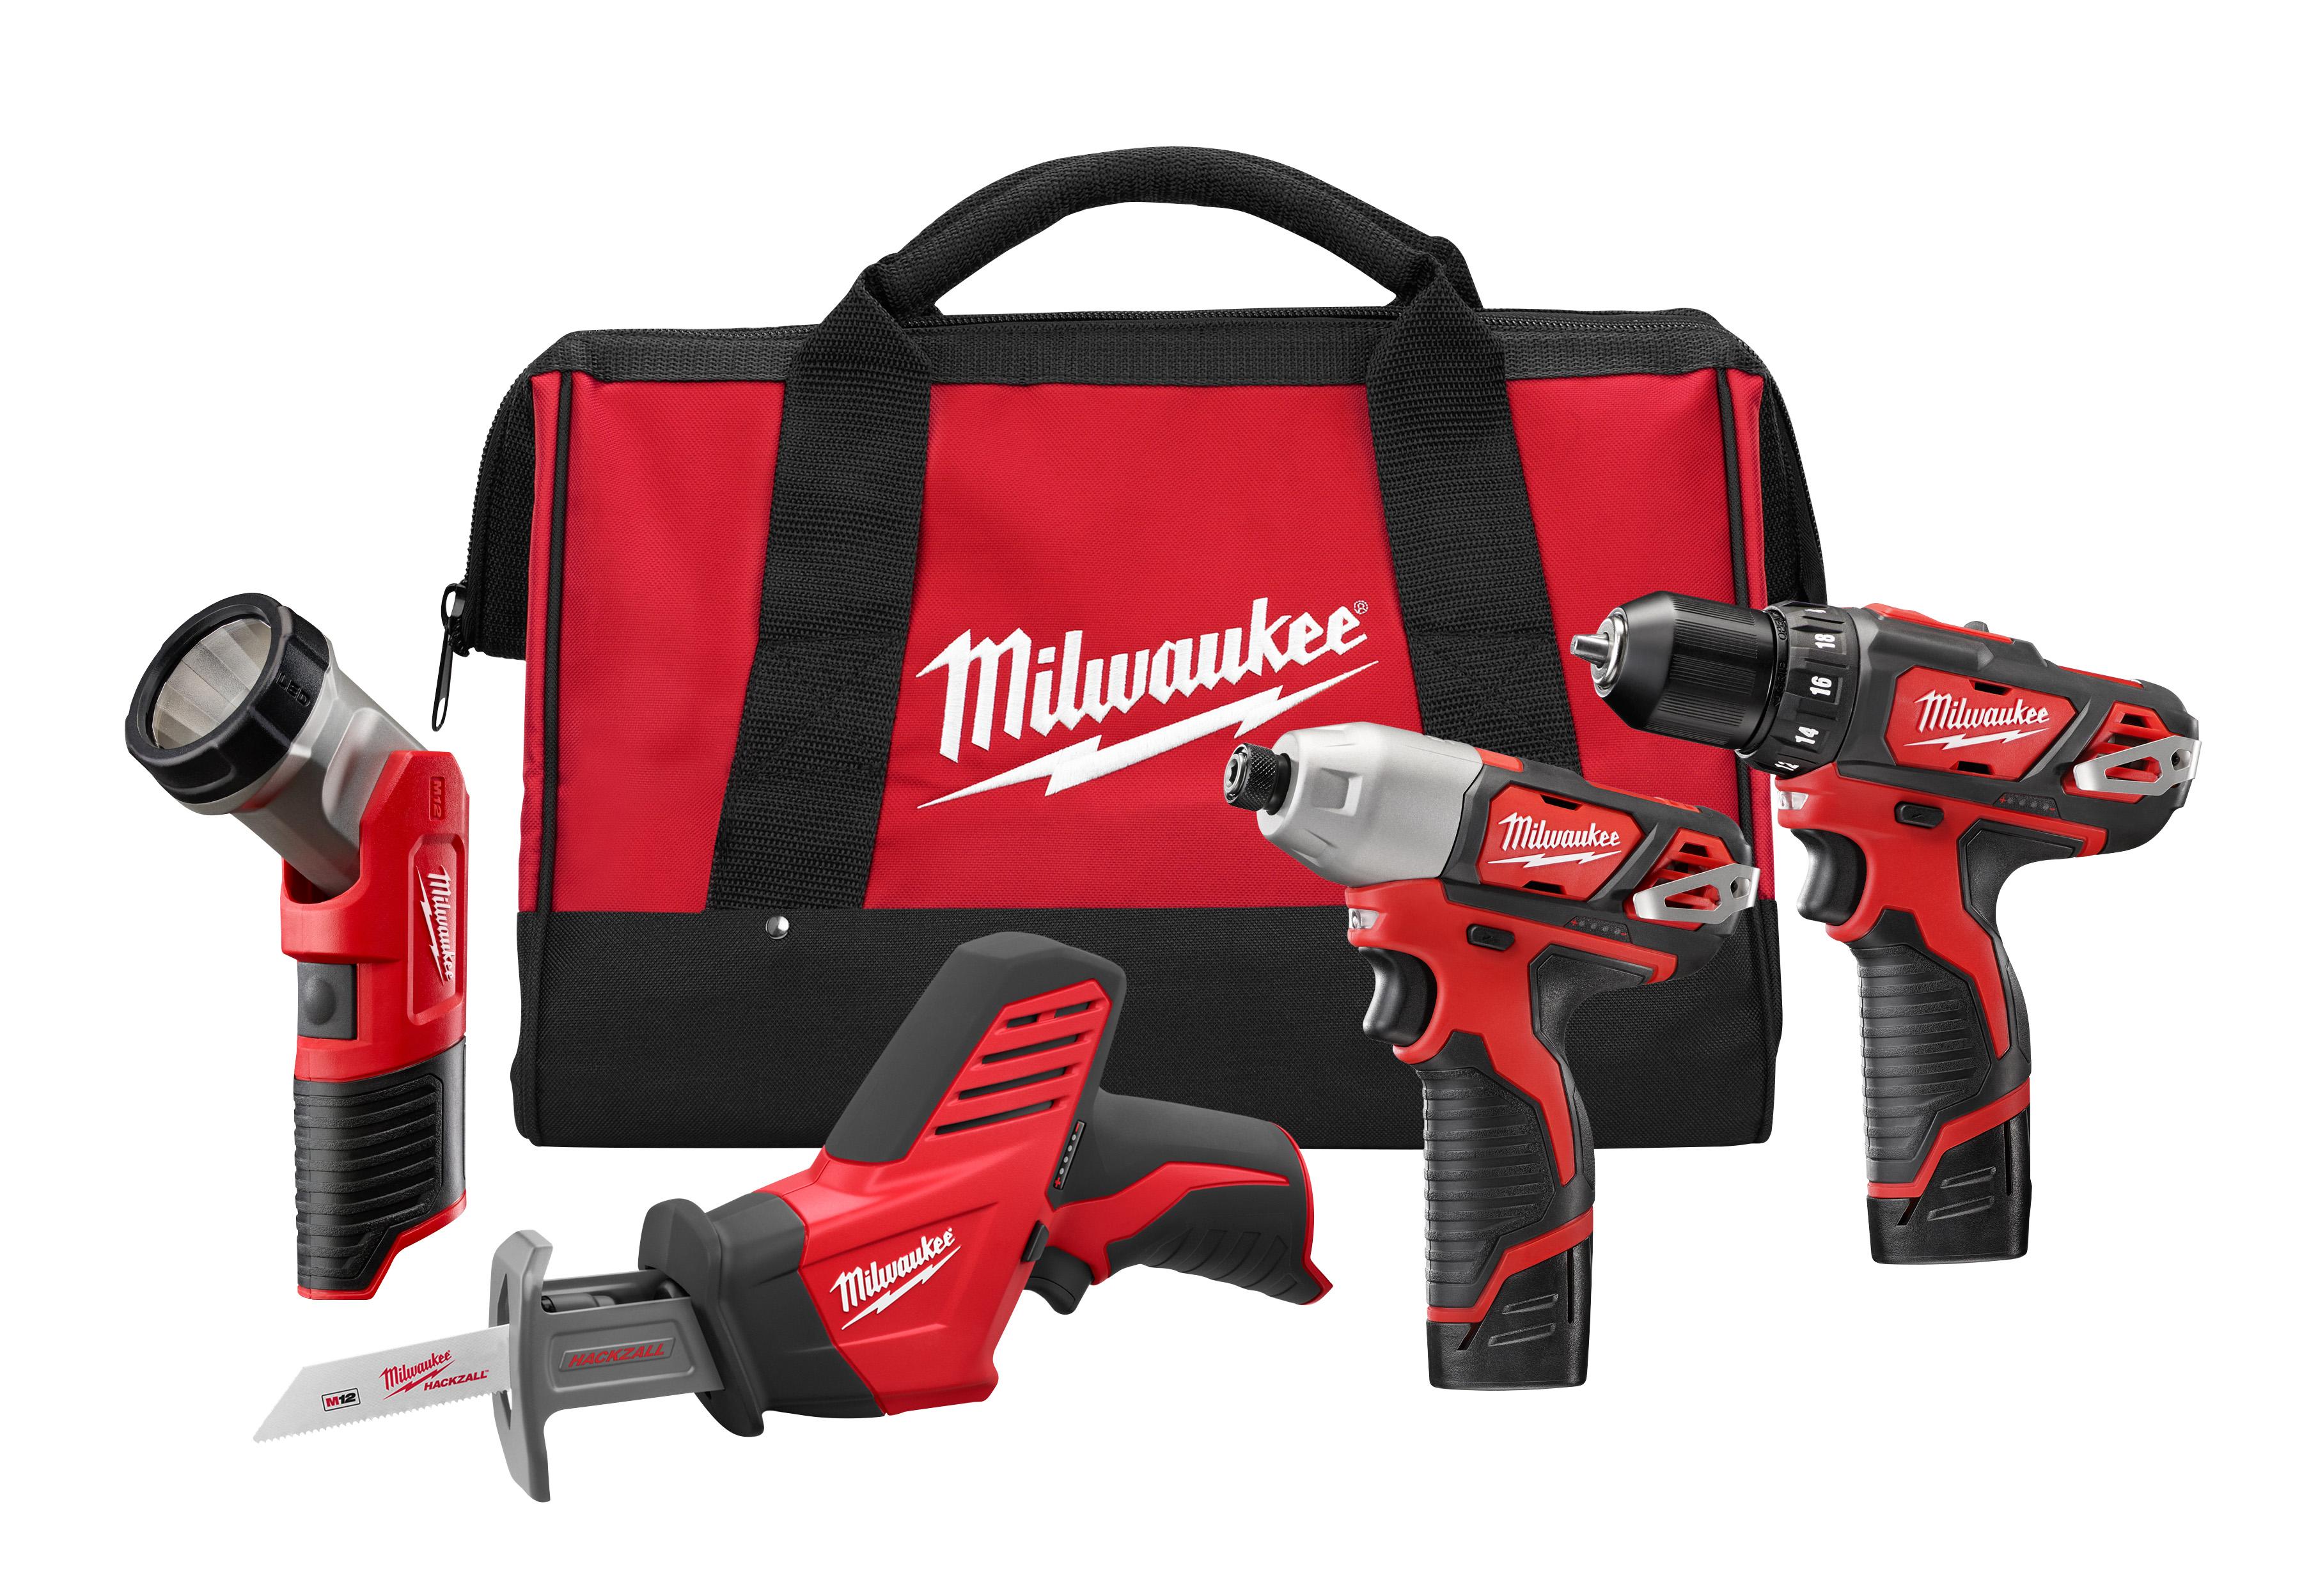 Milwaukee® M18™ REDLITHIUM™ 2697-22 Cordless Combination Kit, Tools: Hammer Drill, Impact Driver, 18 VDC, 3 Ah Lithium-Ion Battery, Keyless Blade